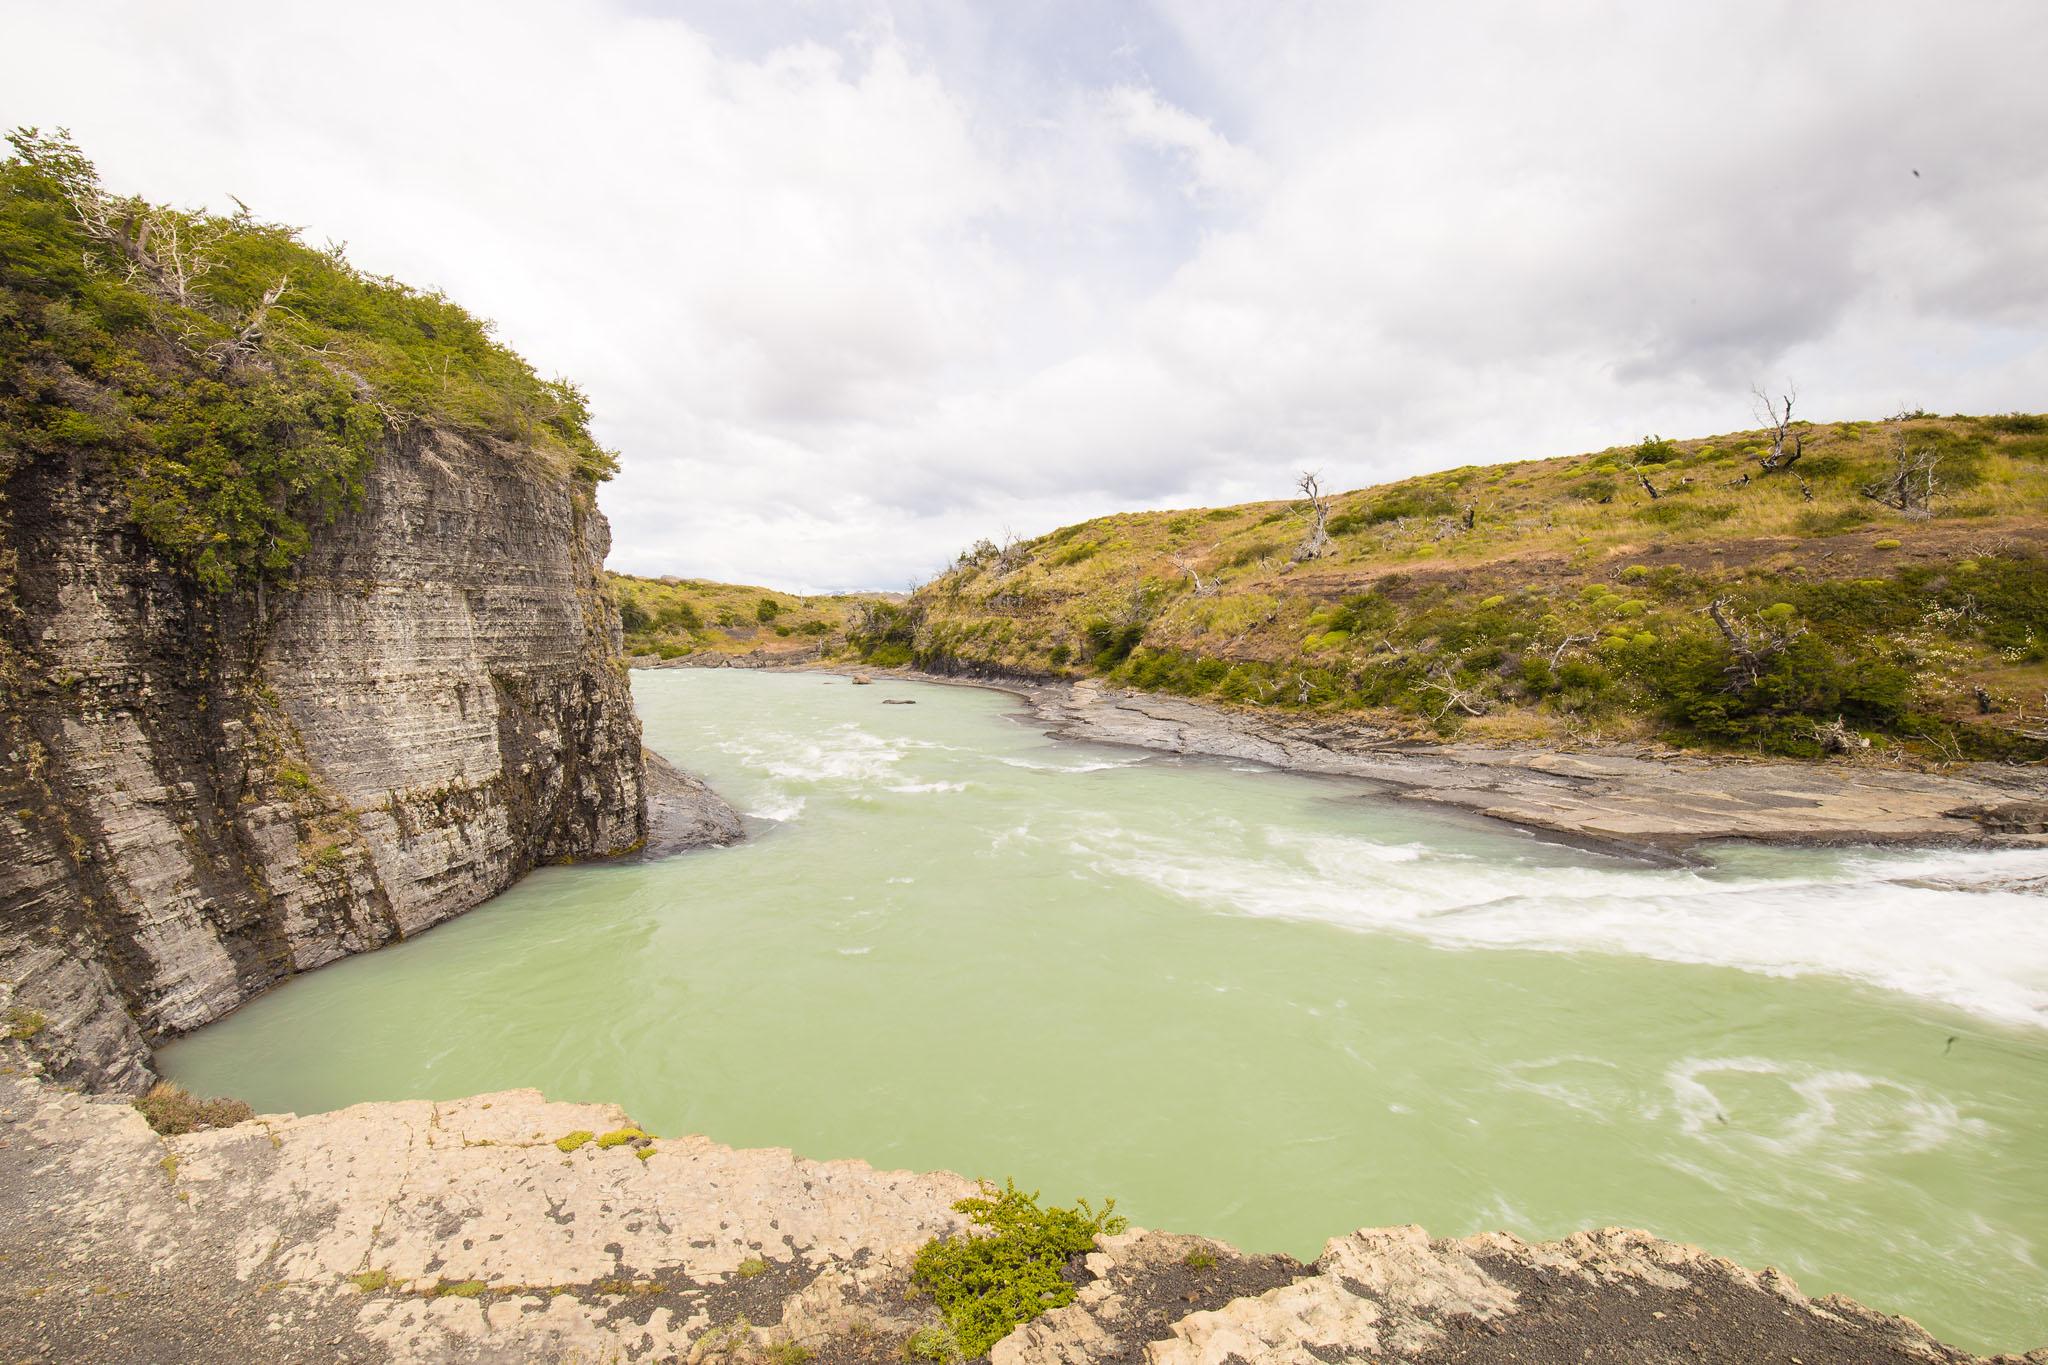 Wedding-Travellers-Overlanding-Destination-Wedding-Chile-Torres-del-Paine-waterfall